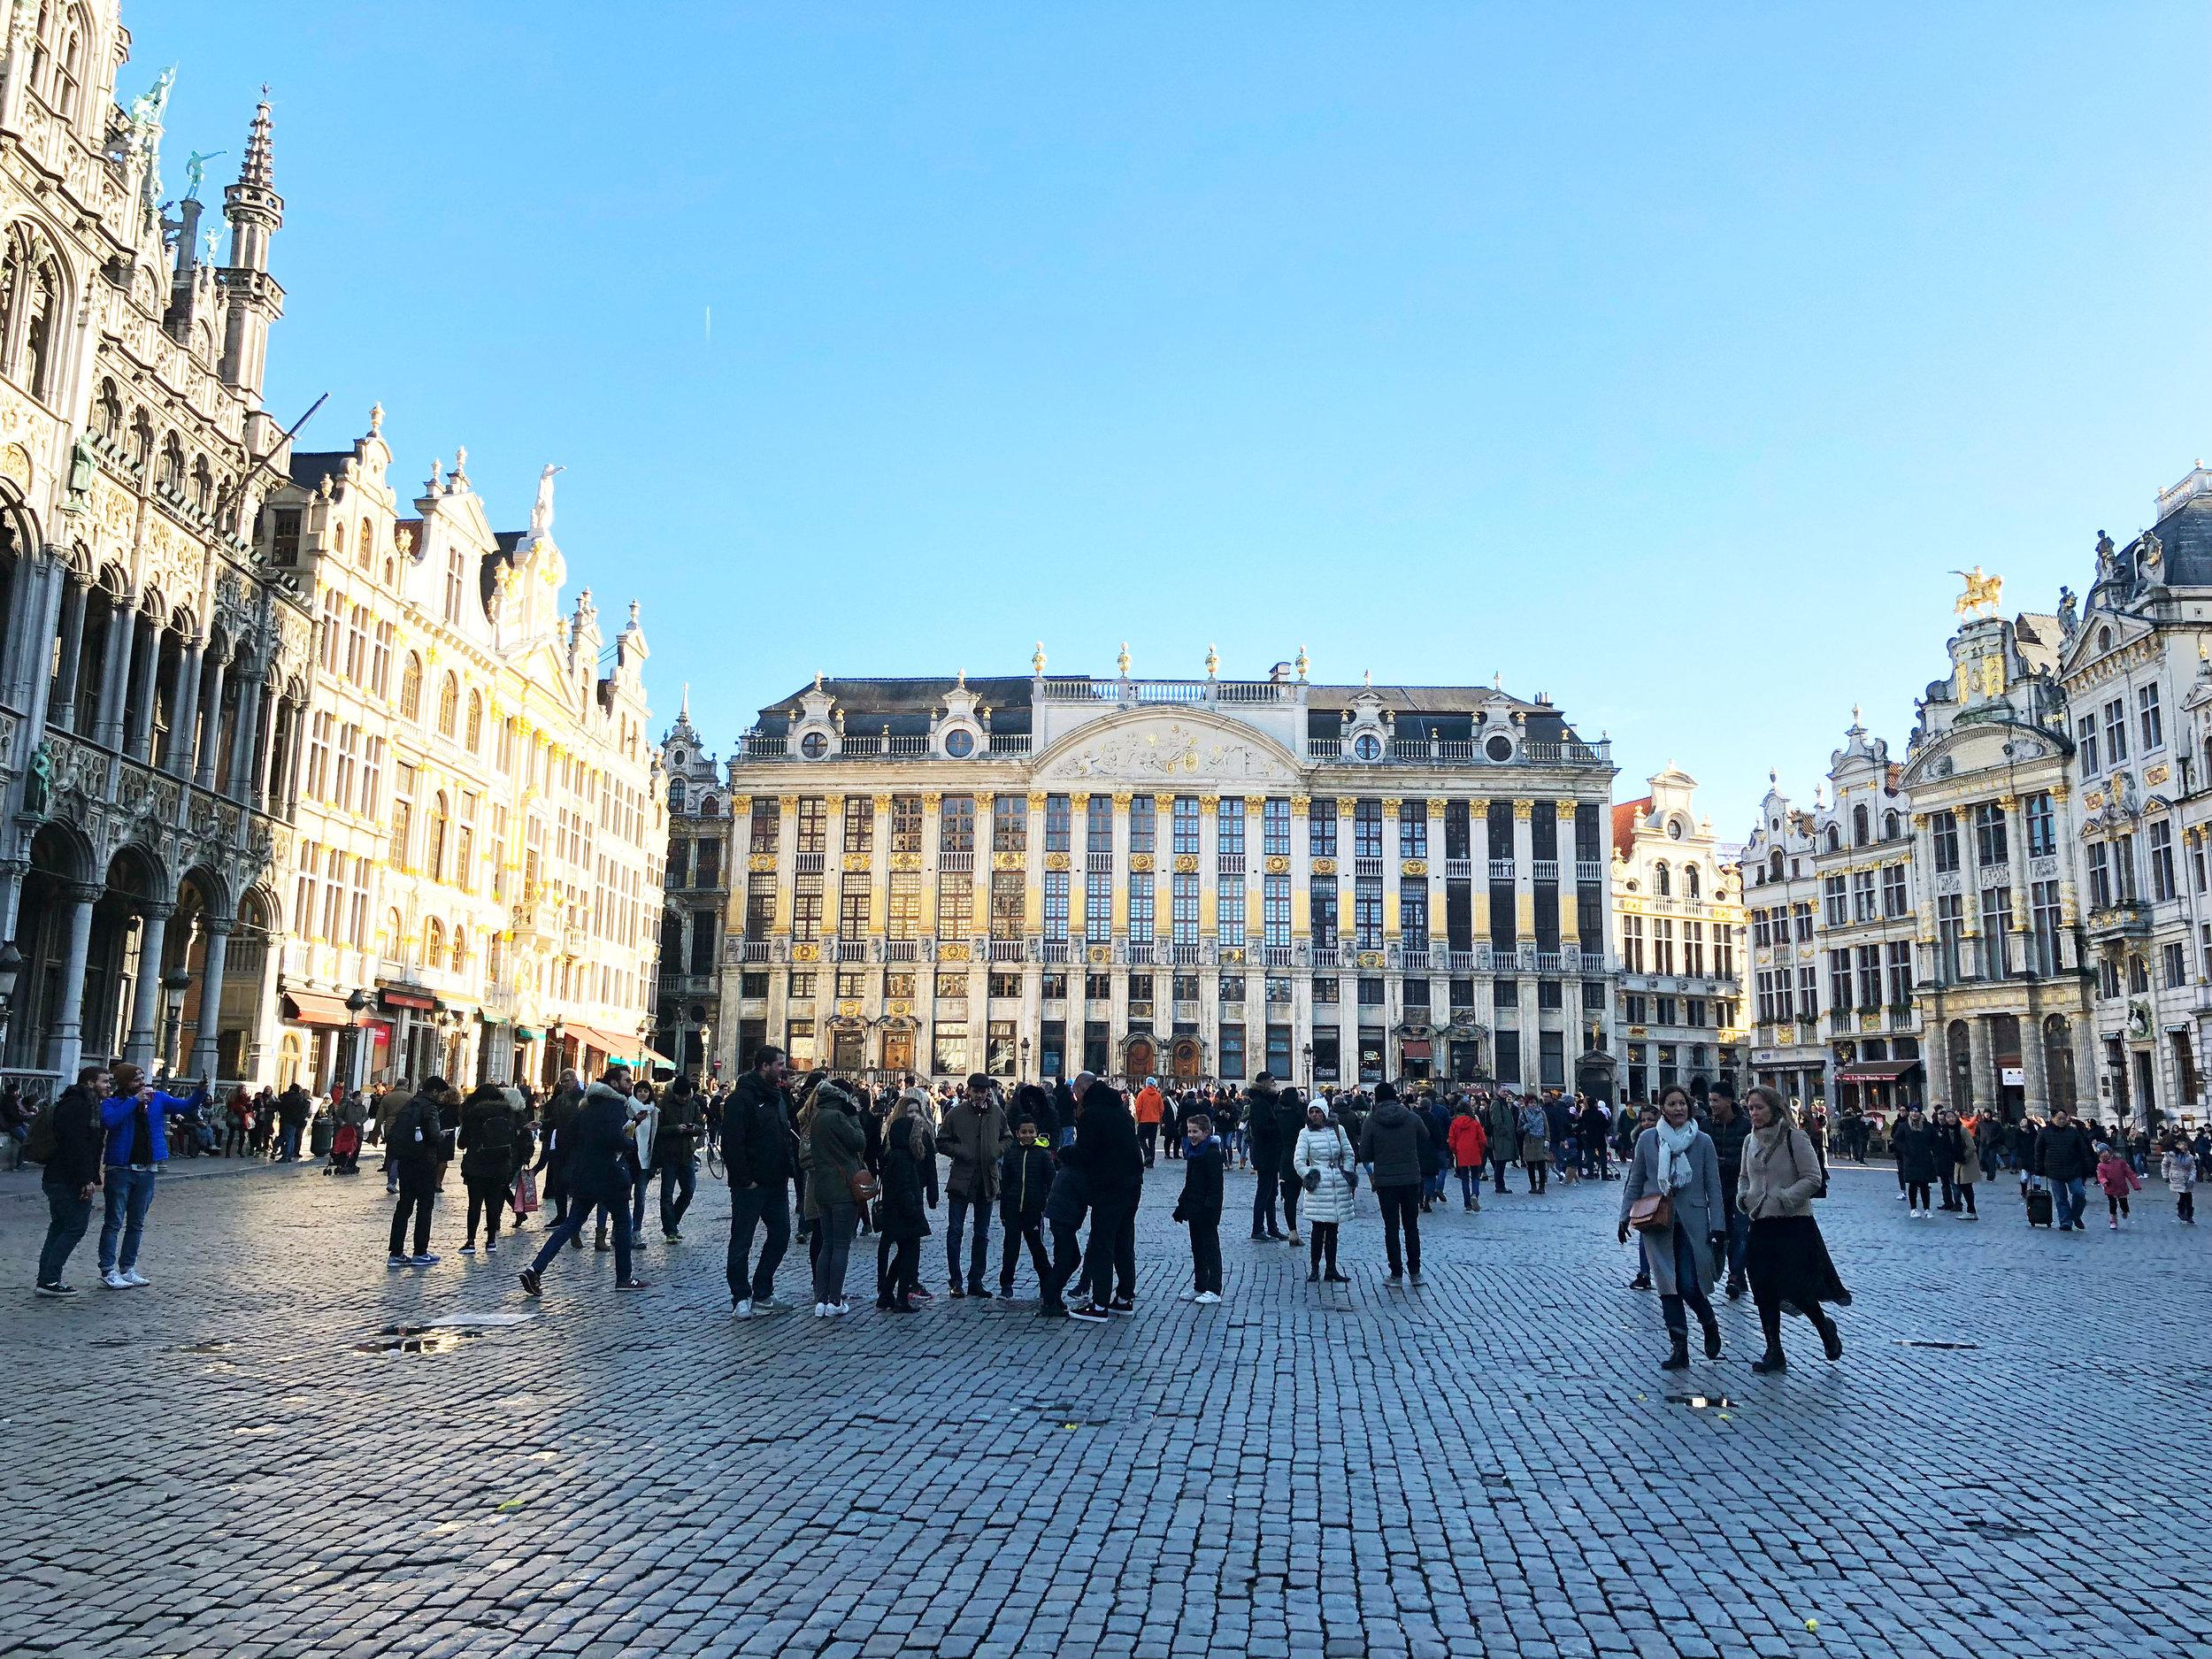 La Grand Place in Brussels, Belgium